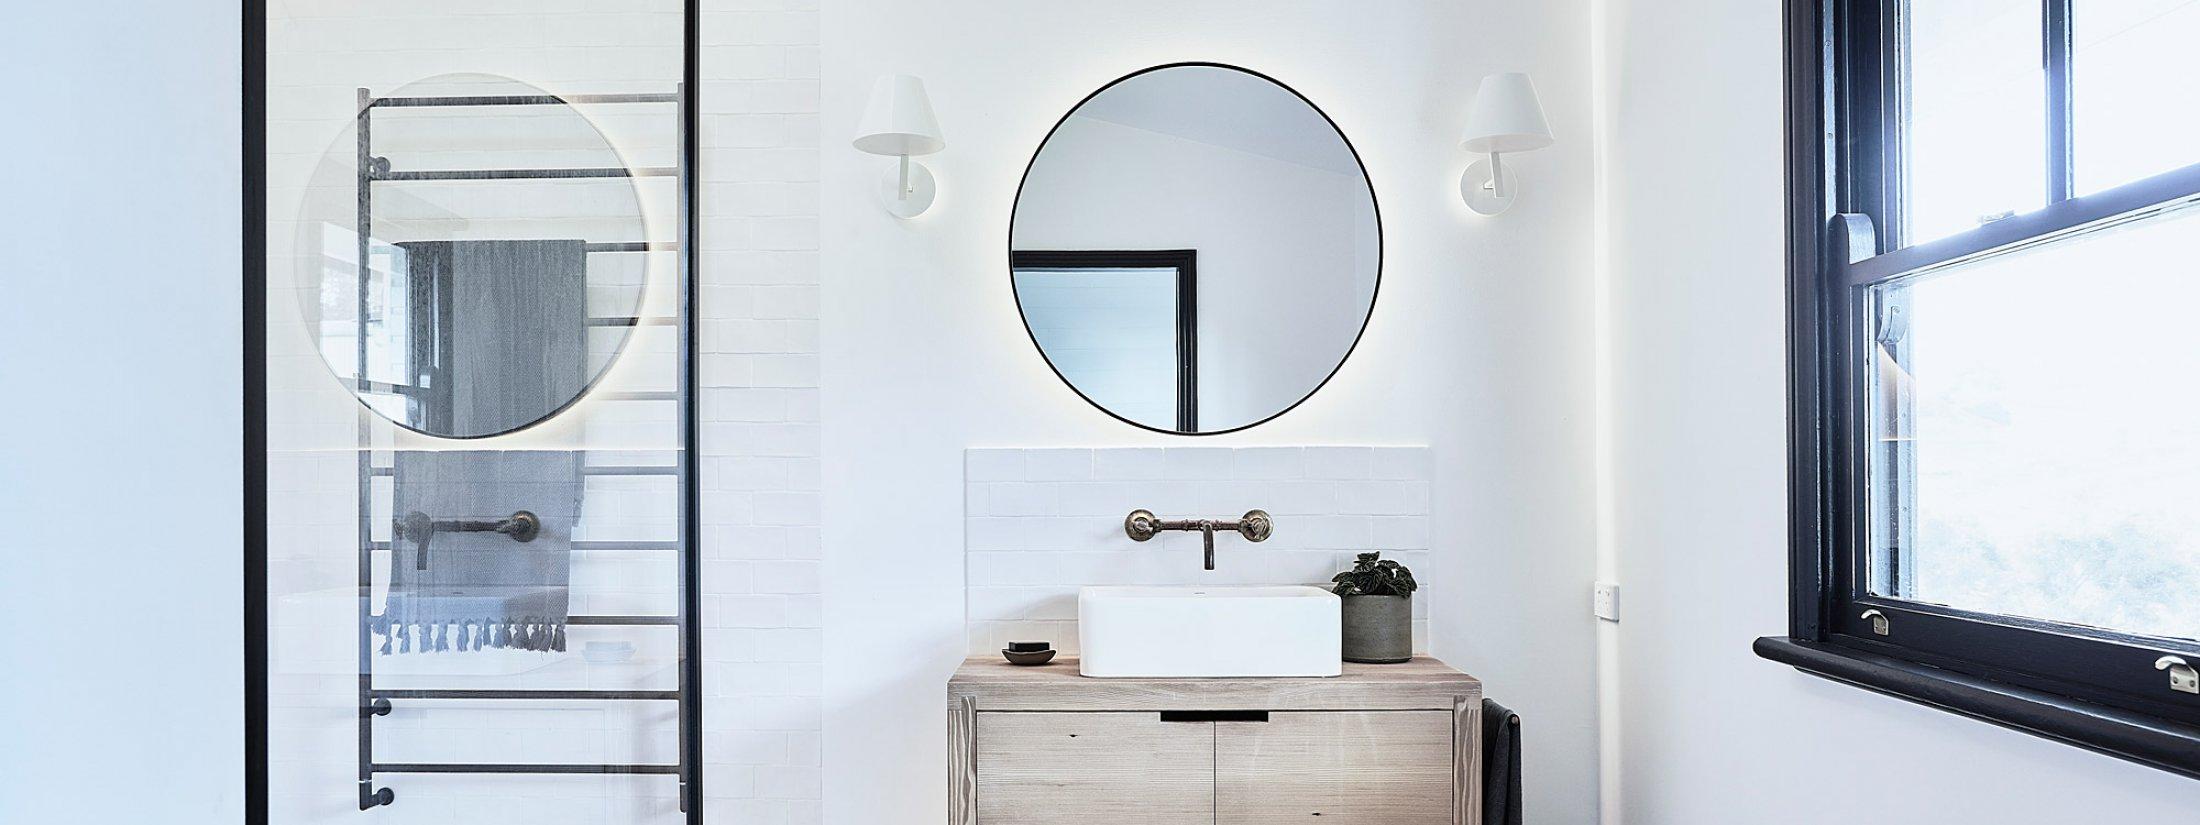 Bennys Cottage - Byron Bay - Real Living Shoot Bathroom with Lights